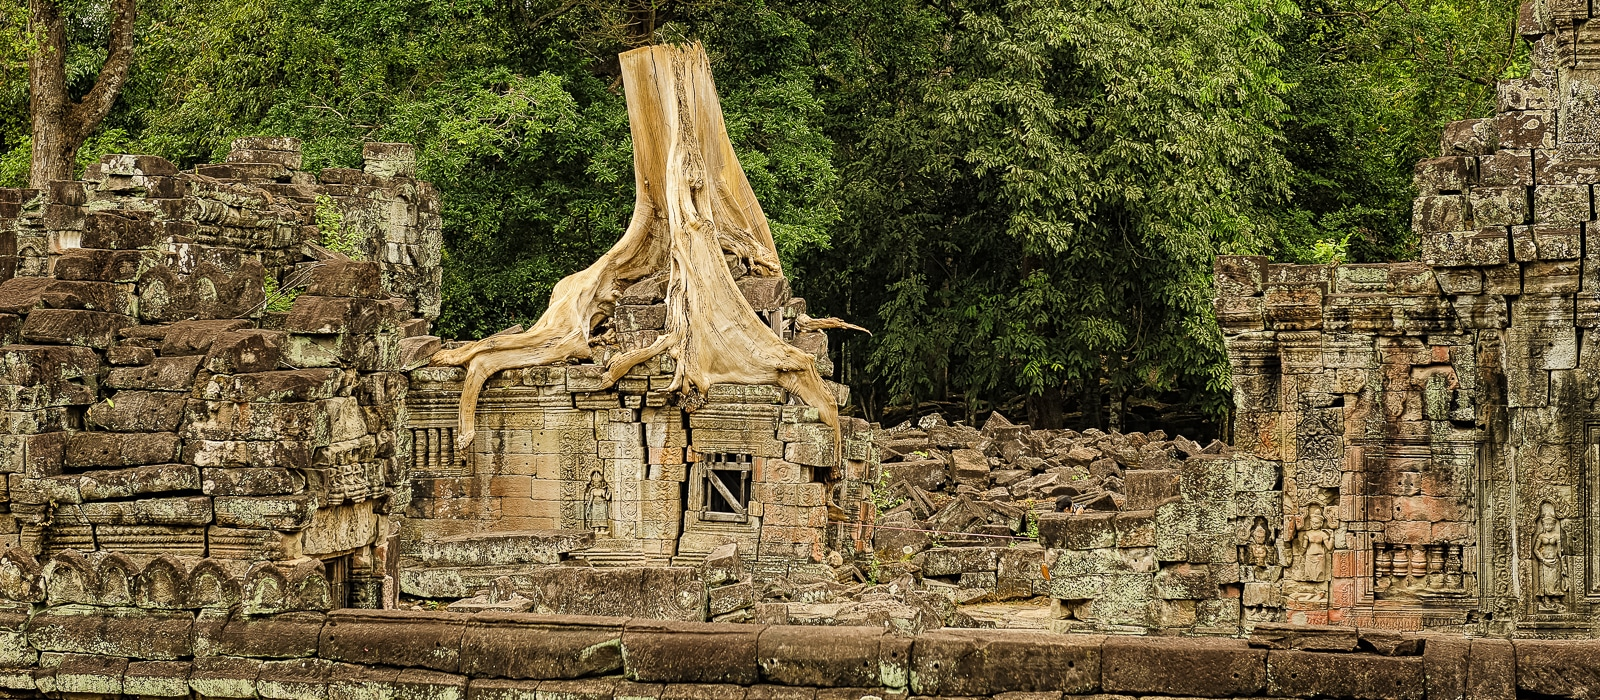 thumb - Cambodge-1600x700-10-2.jpg